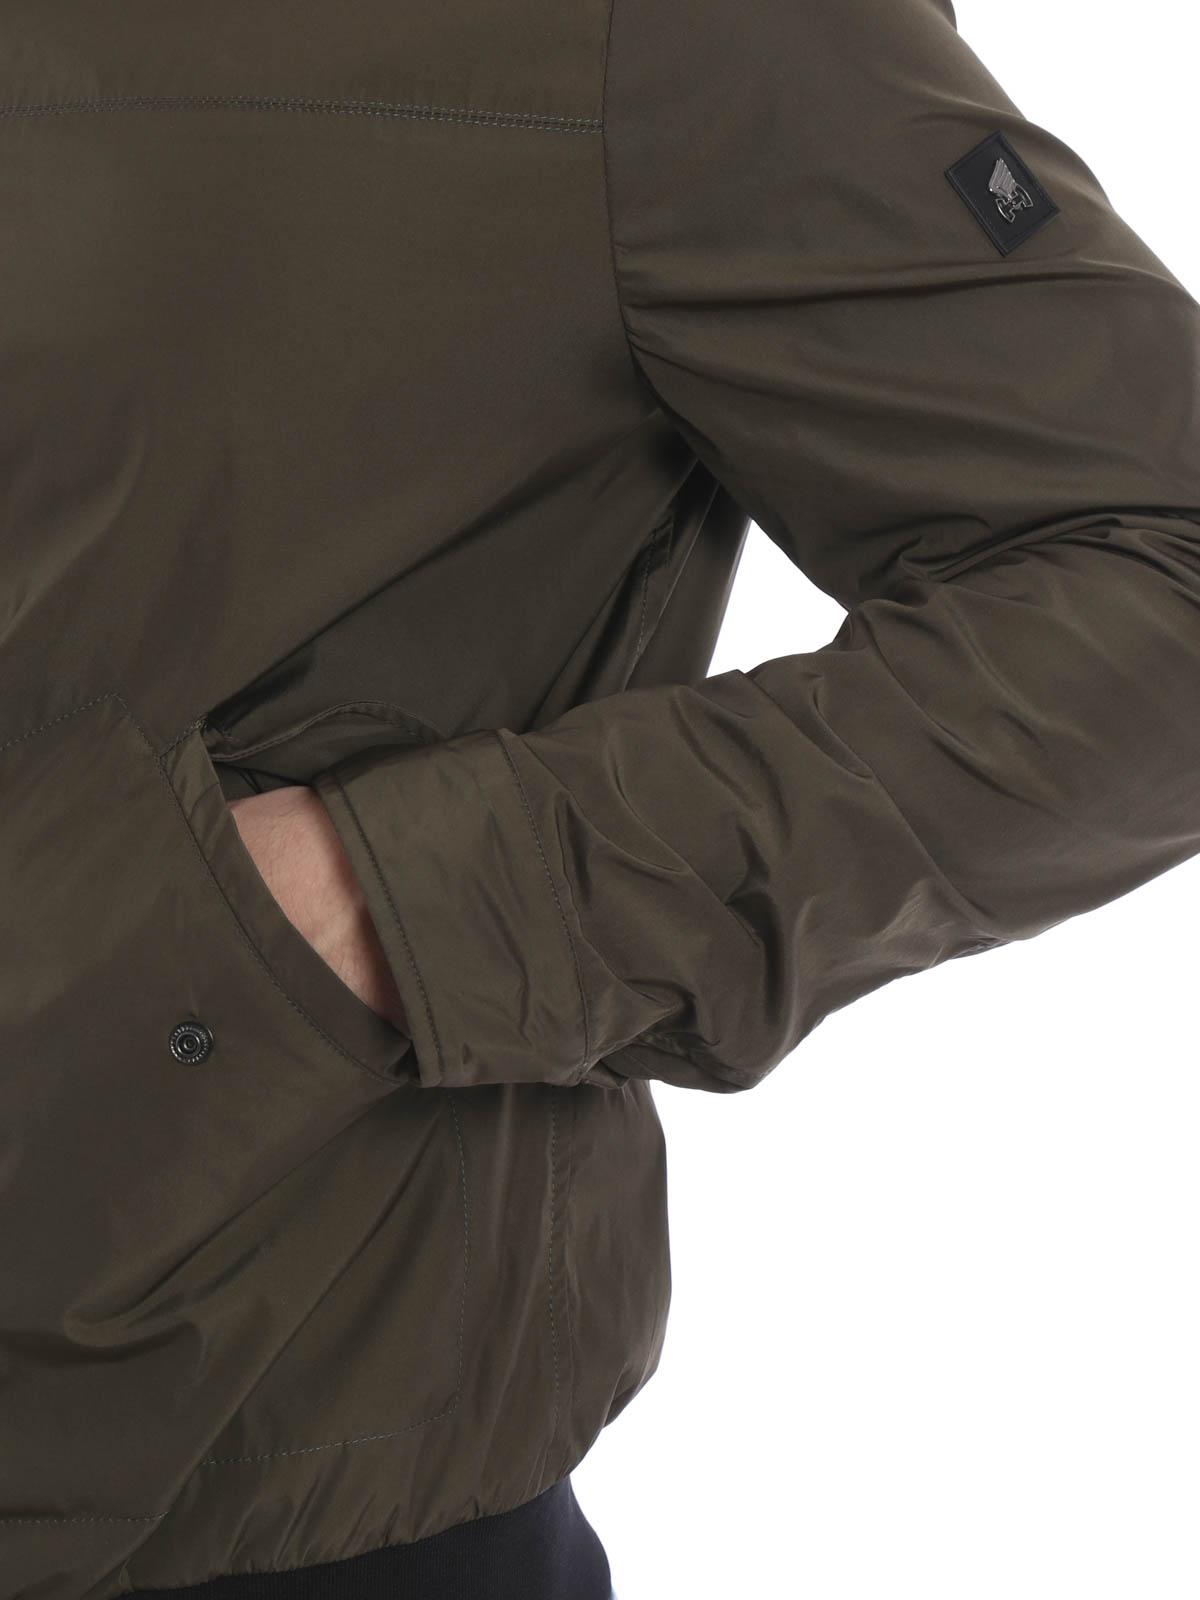 Bombers Hogan - Nylon bomber jacket - KJM11322060MHXV604 | iKRIX.com